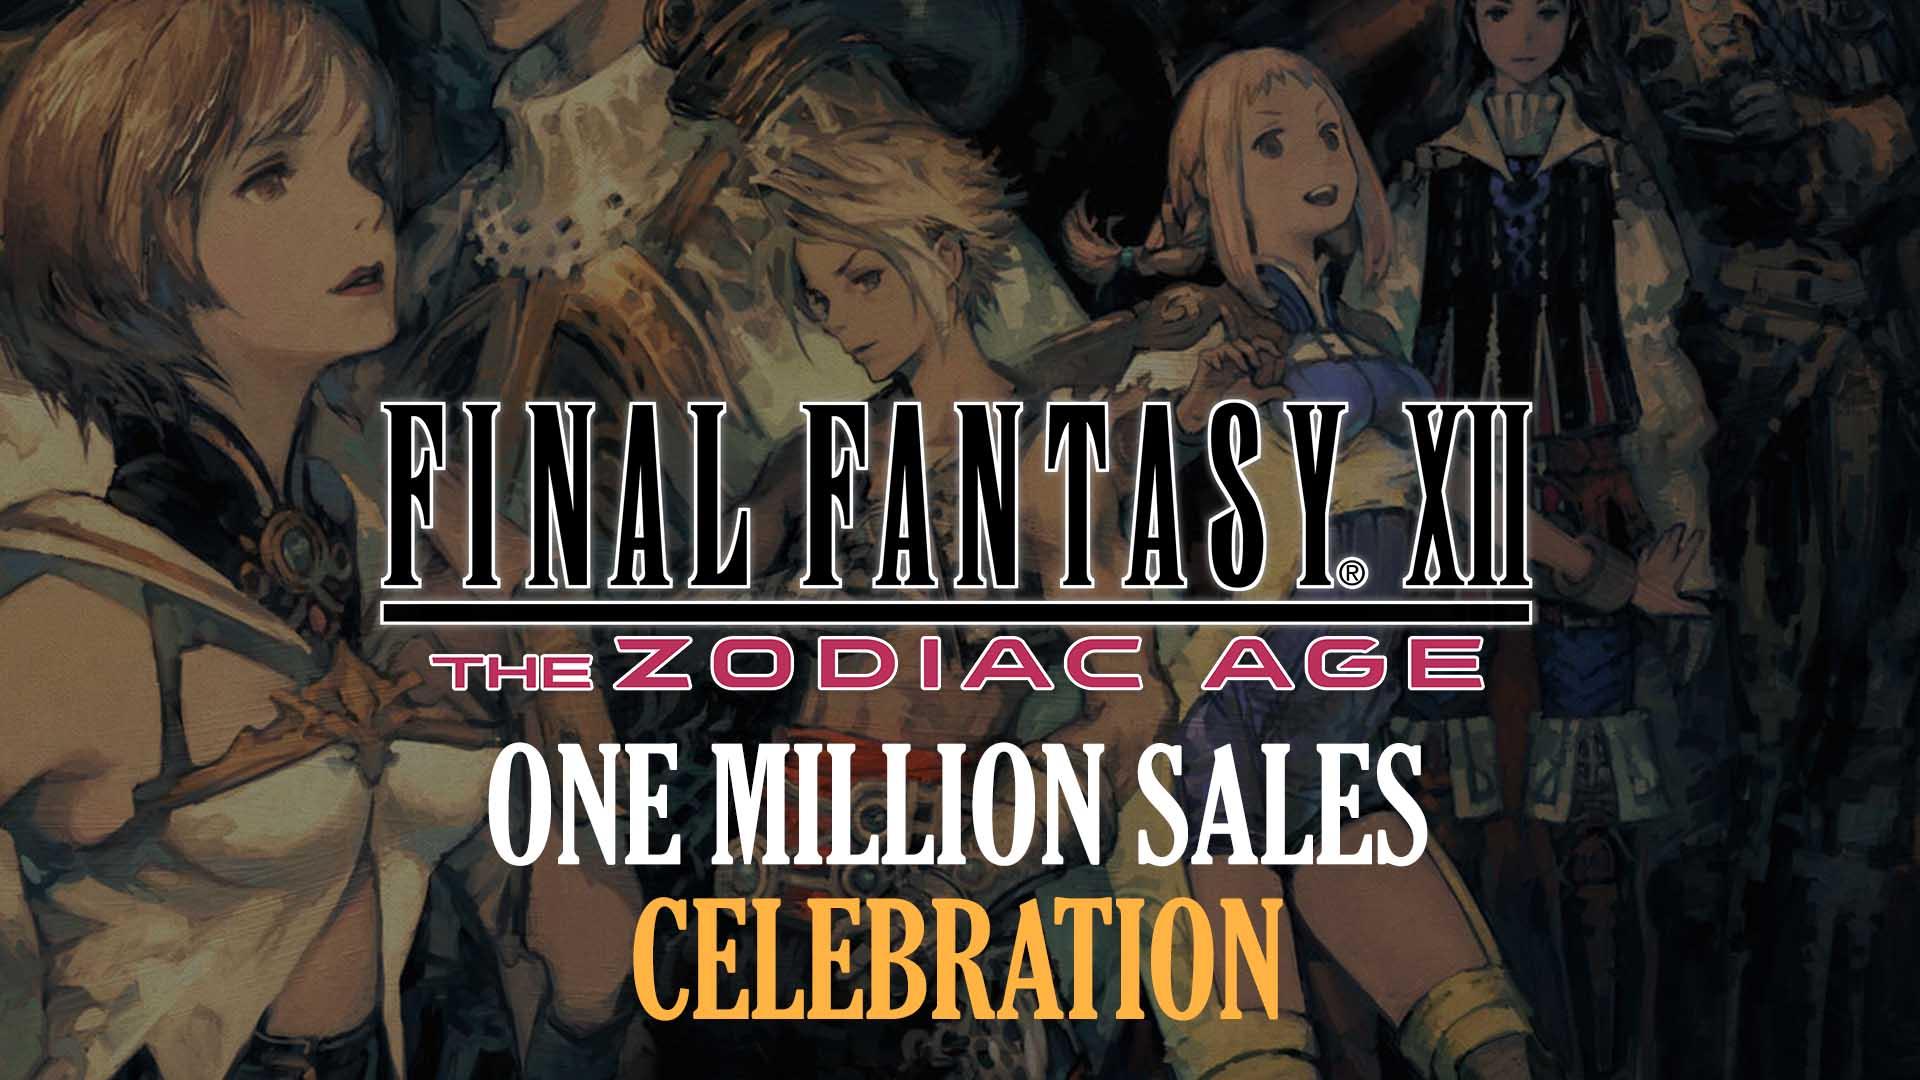 Final Fantasy Xii The Zodiac Age Celebrates 1 Million Sales With